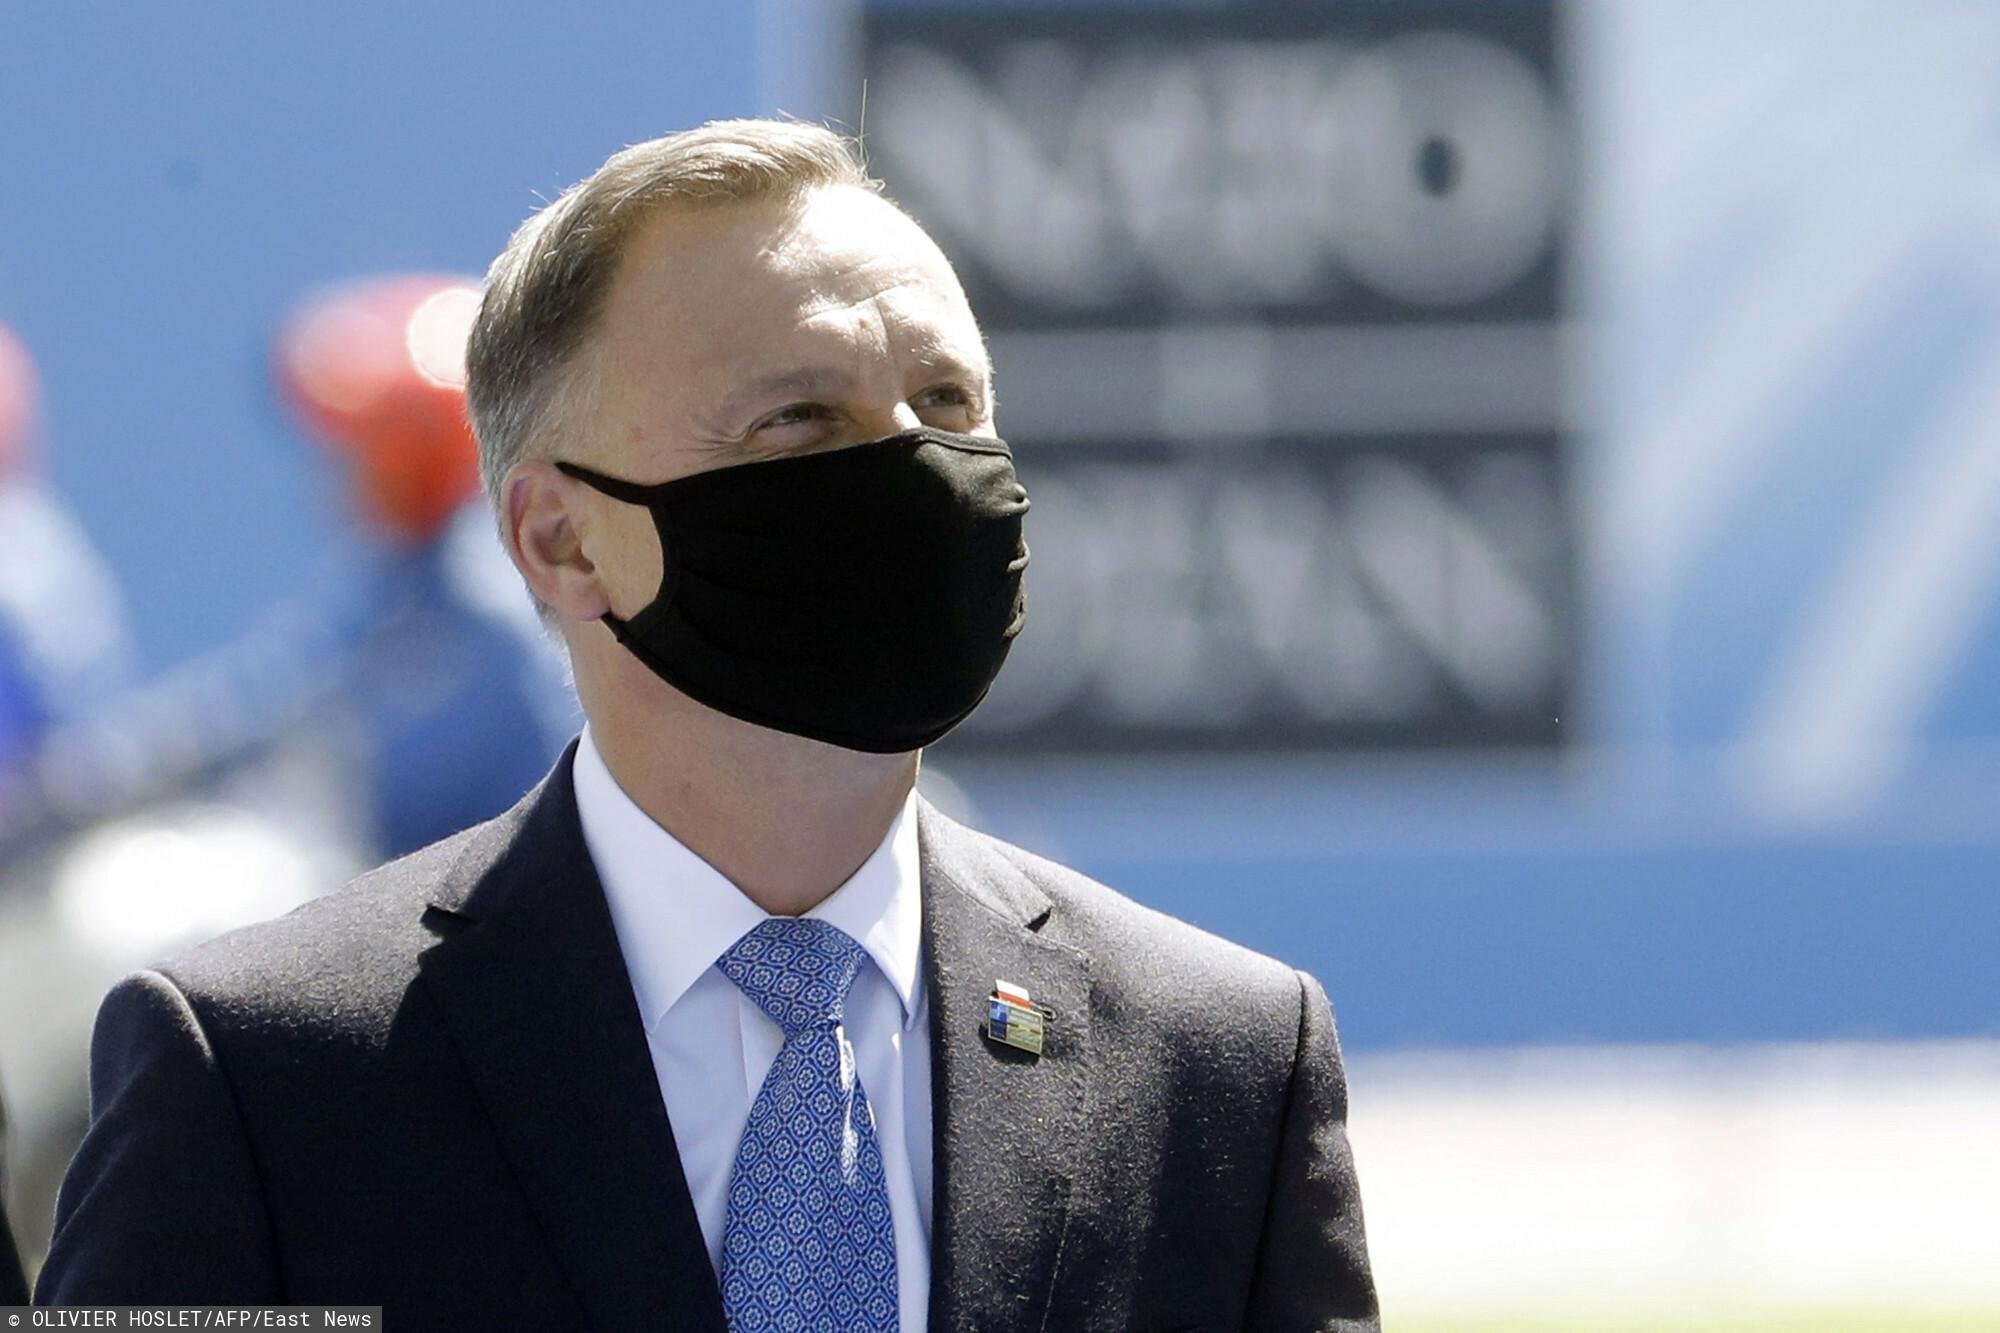 OLIVIER HOSLET/AFP/East News - Andrzej Duda na szczycie NATO